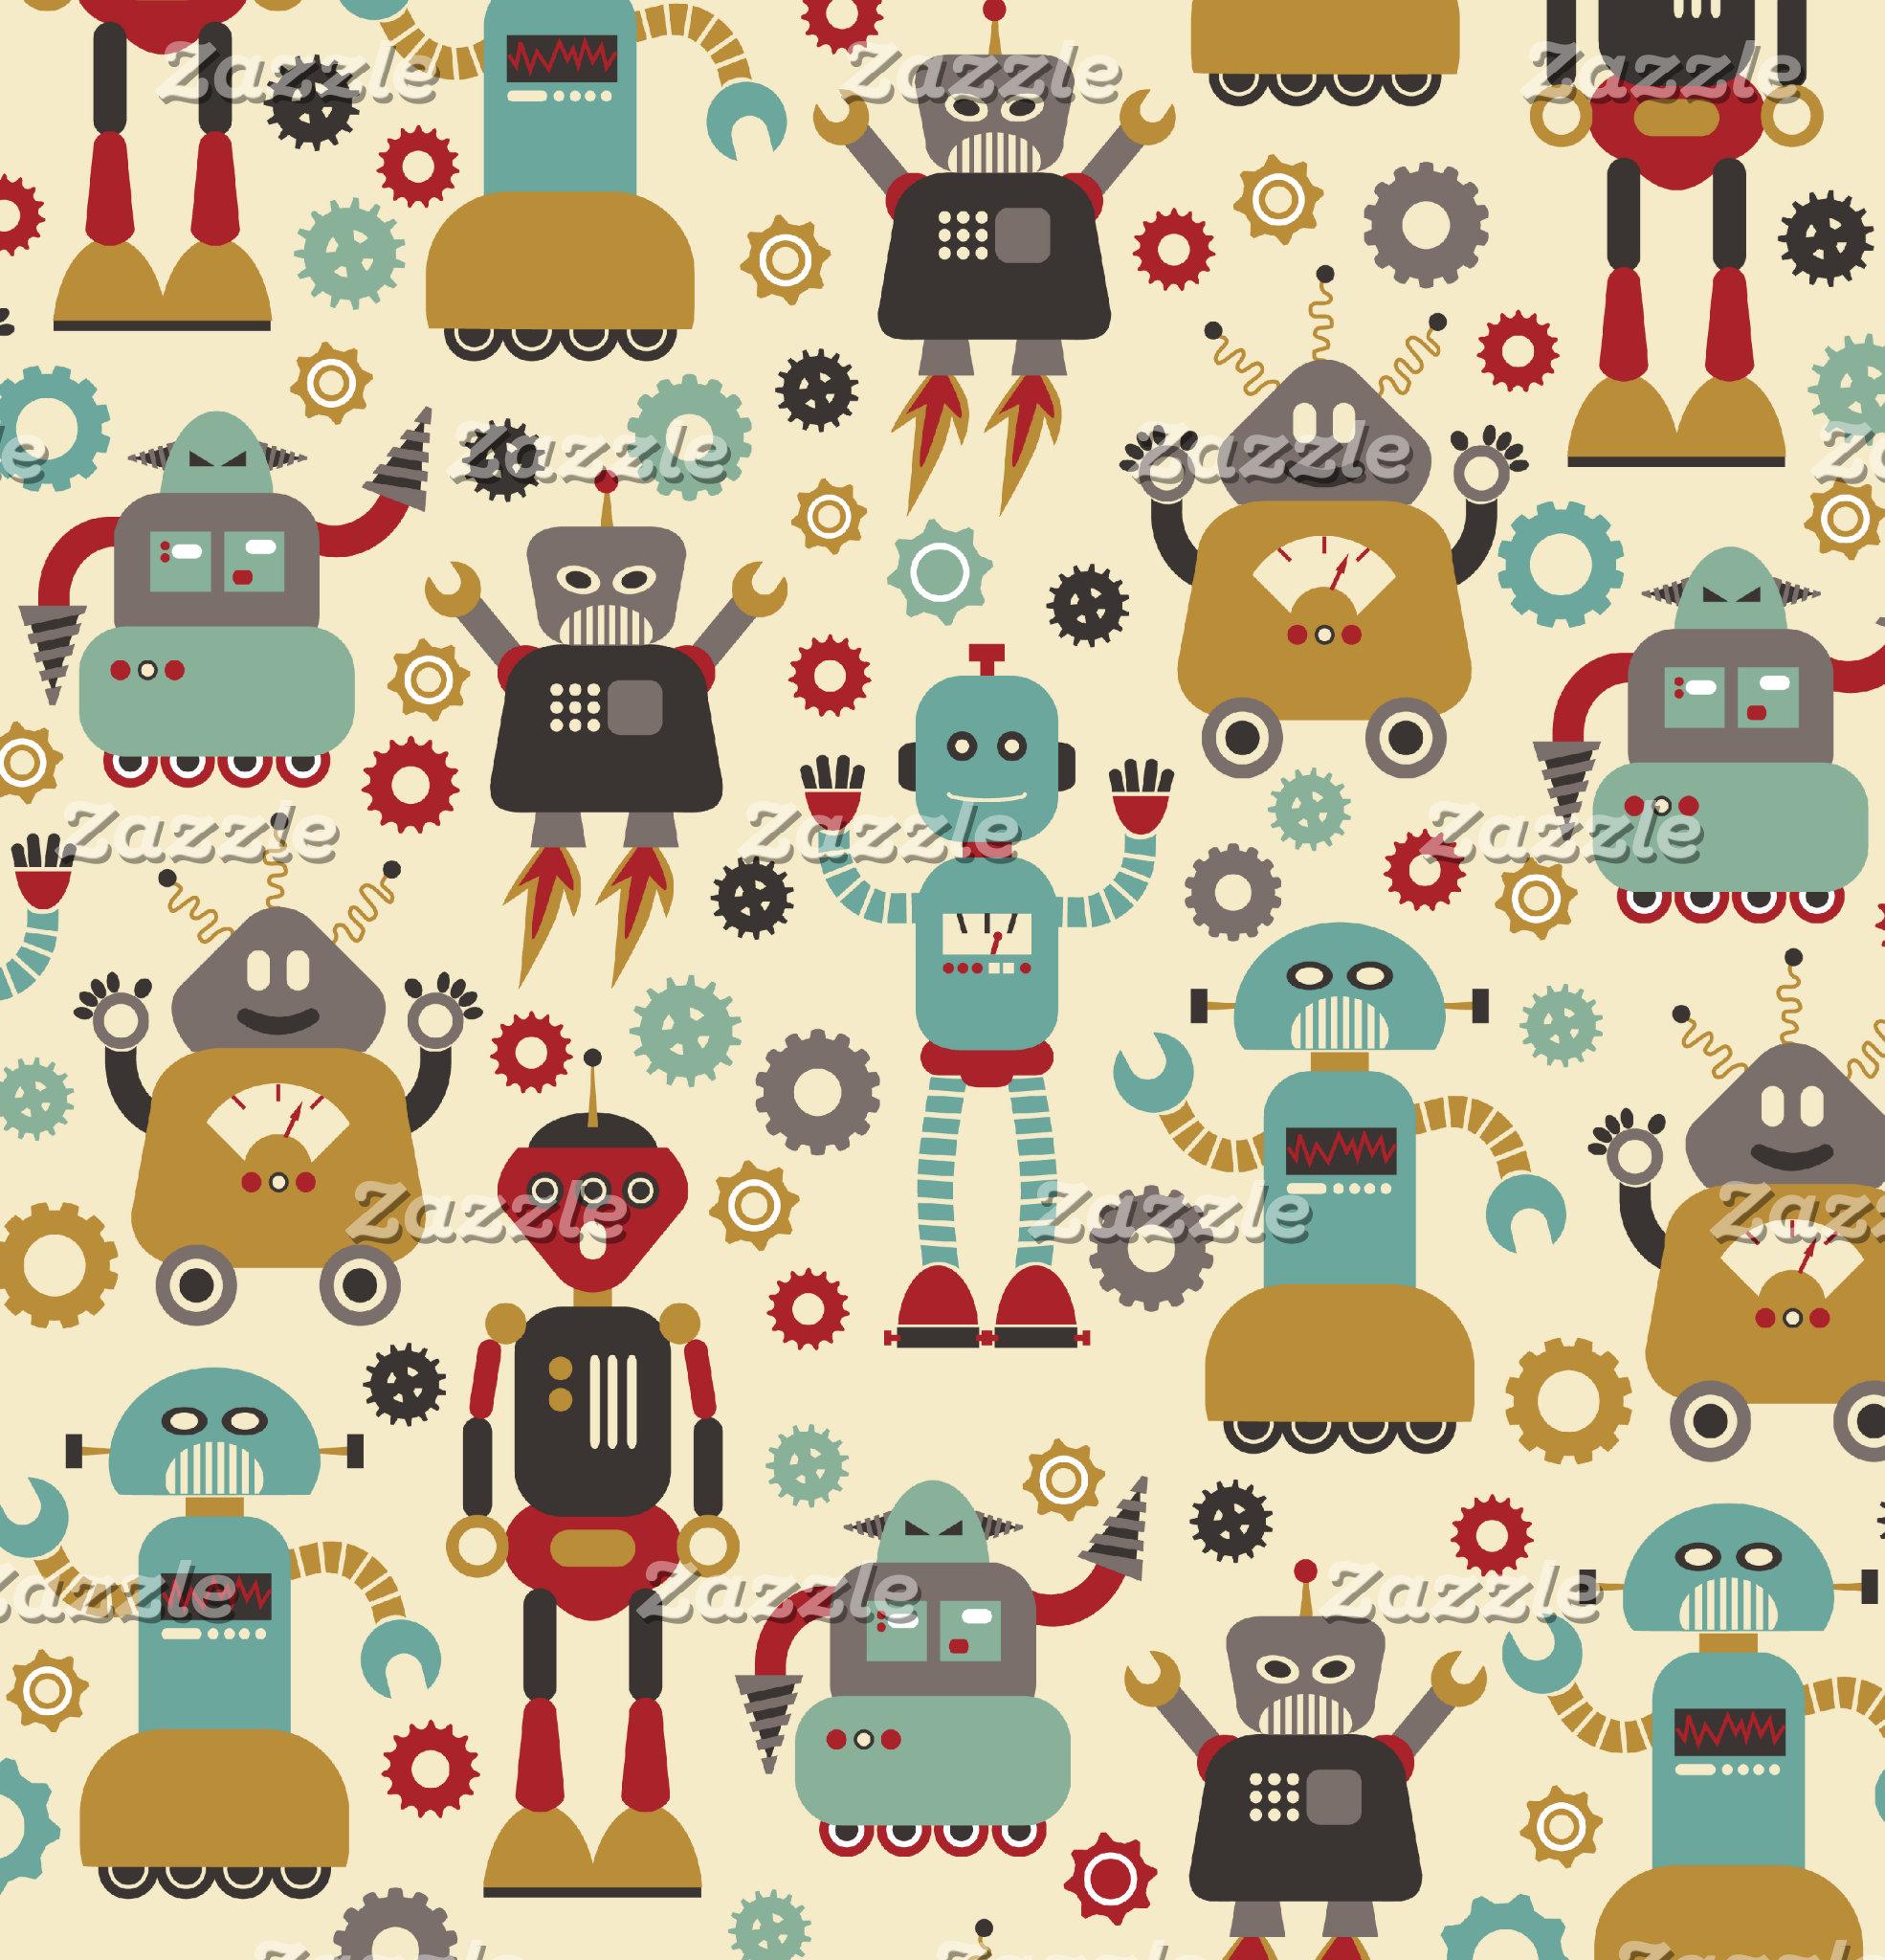 Retro Robots